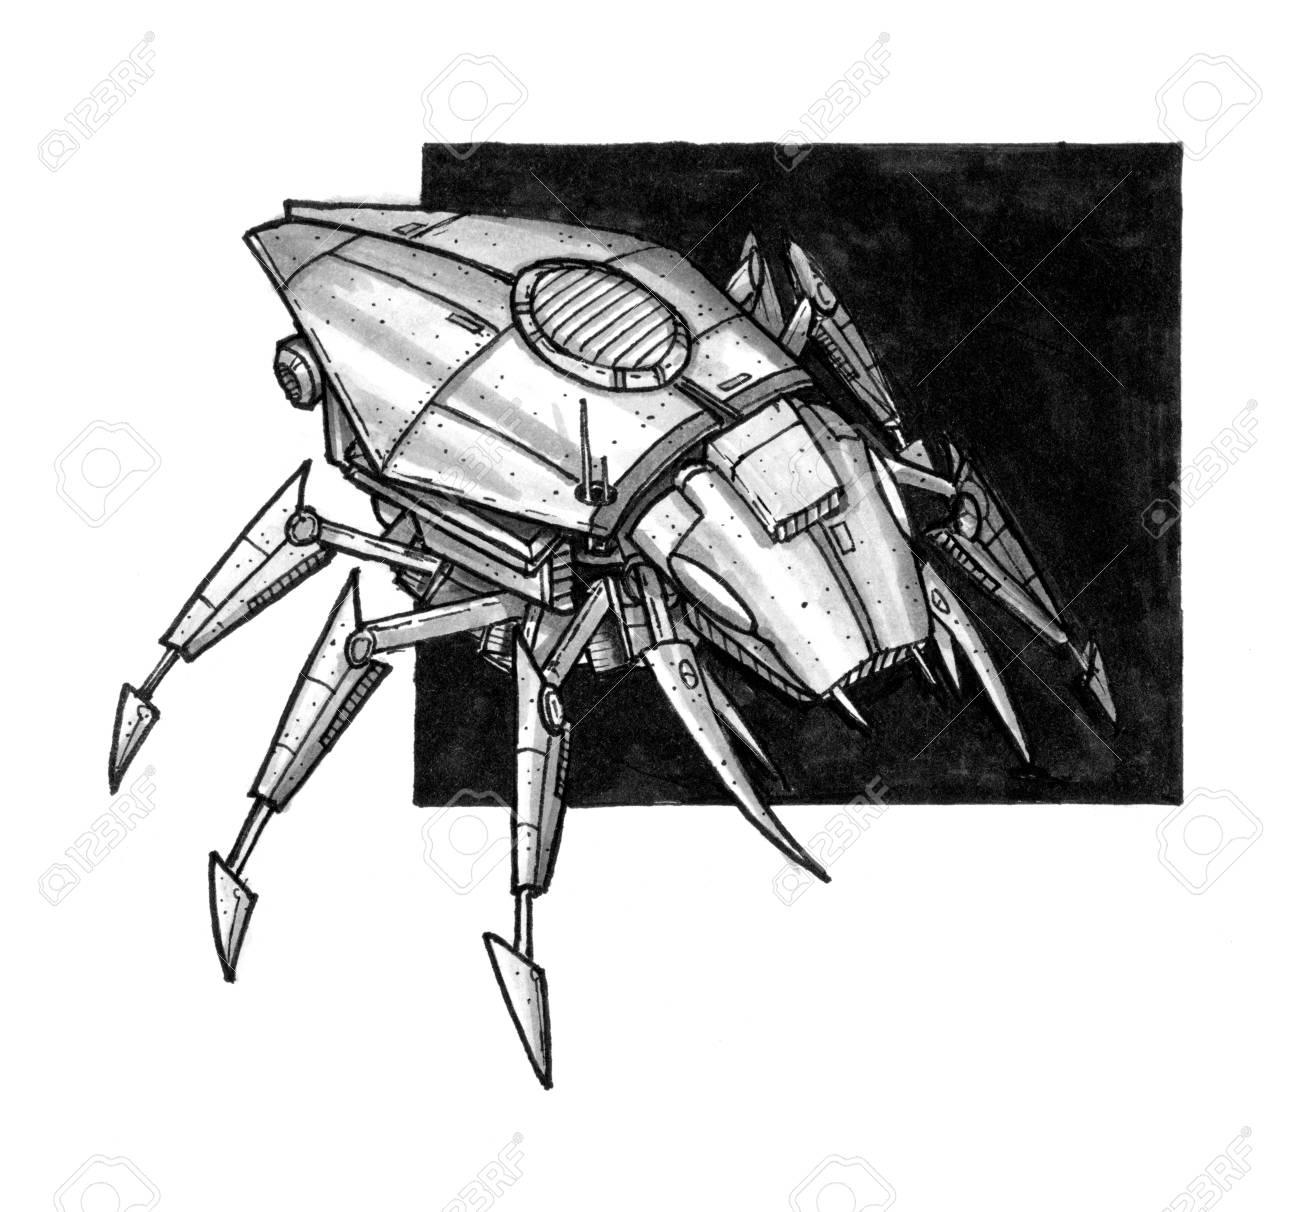 Concept Art Sci Fi Robot Soldier